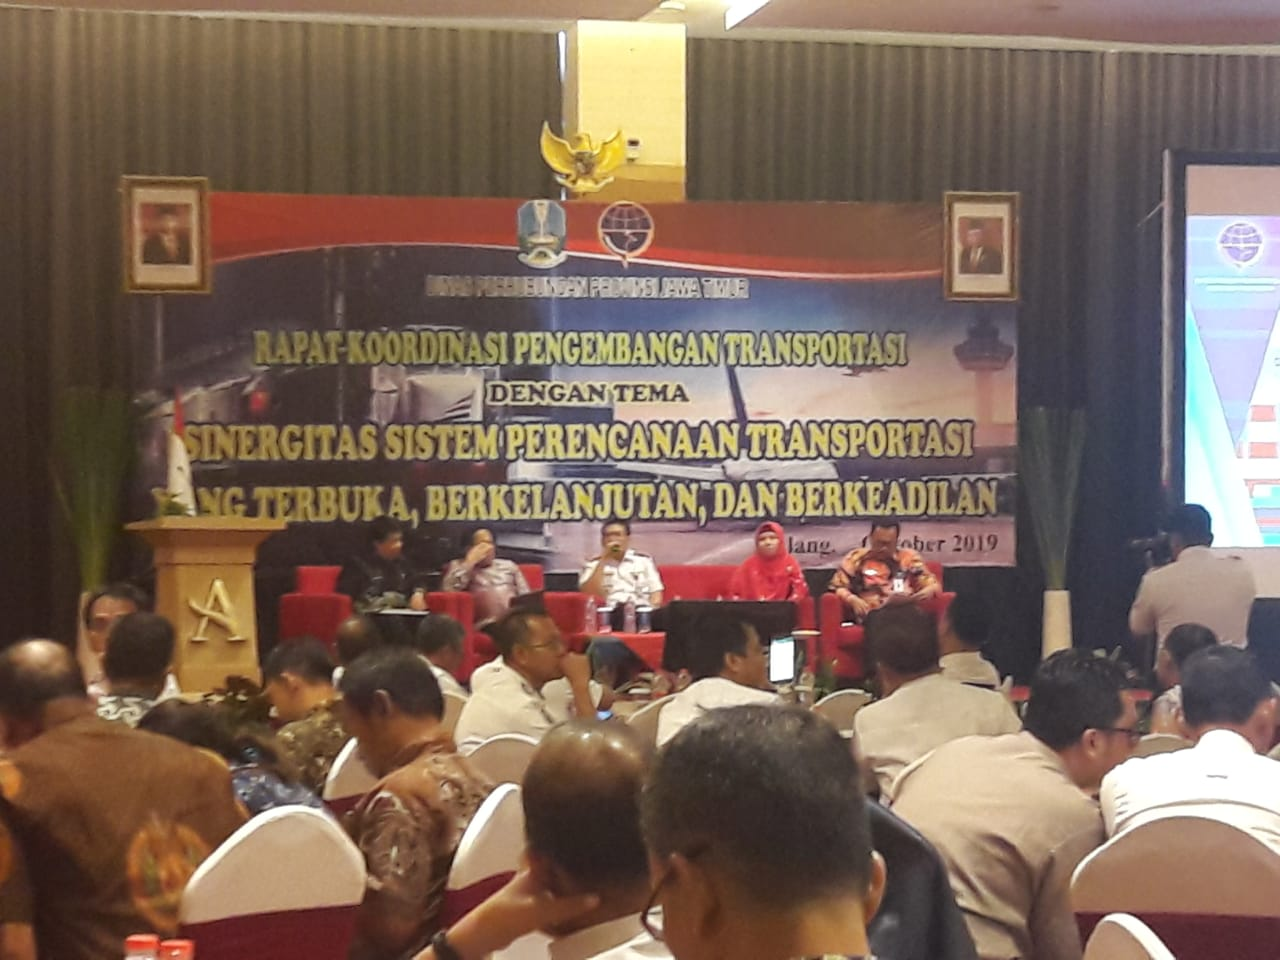 Rapat Koordinasi Pengembangan Transportasi dg tema Sinergitas Sistem Perencanaan Transportasi yg Ter